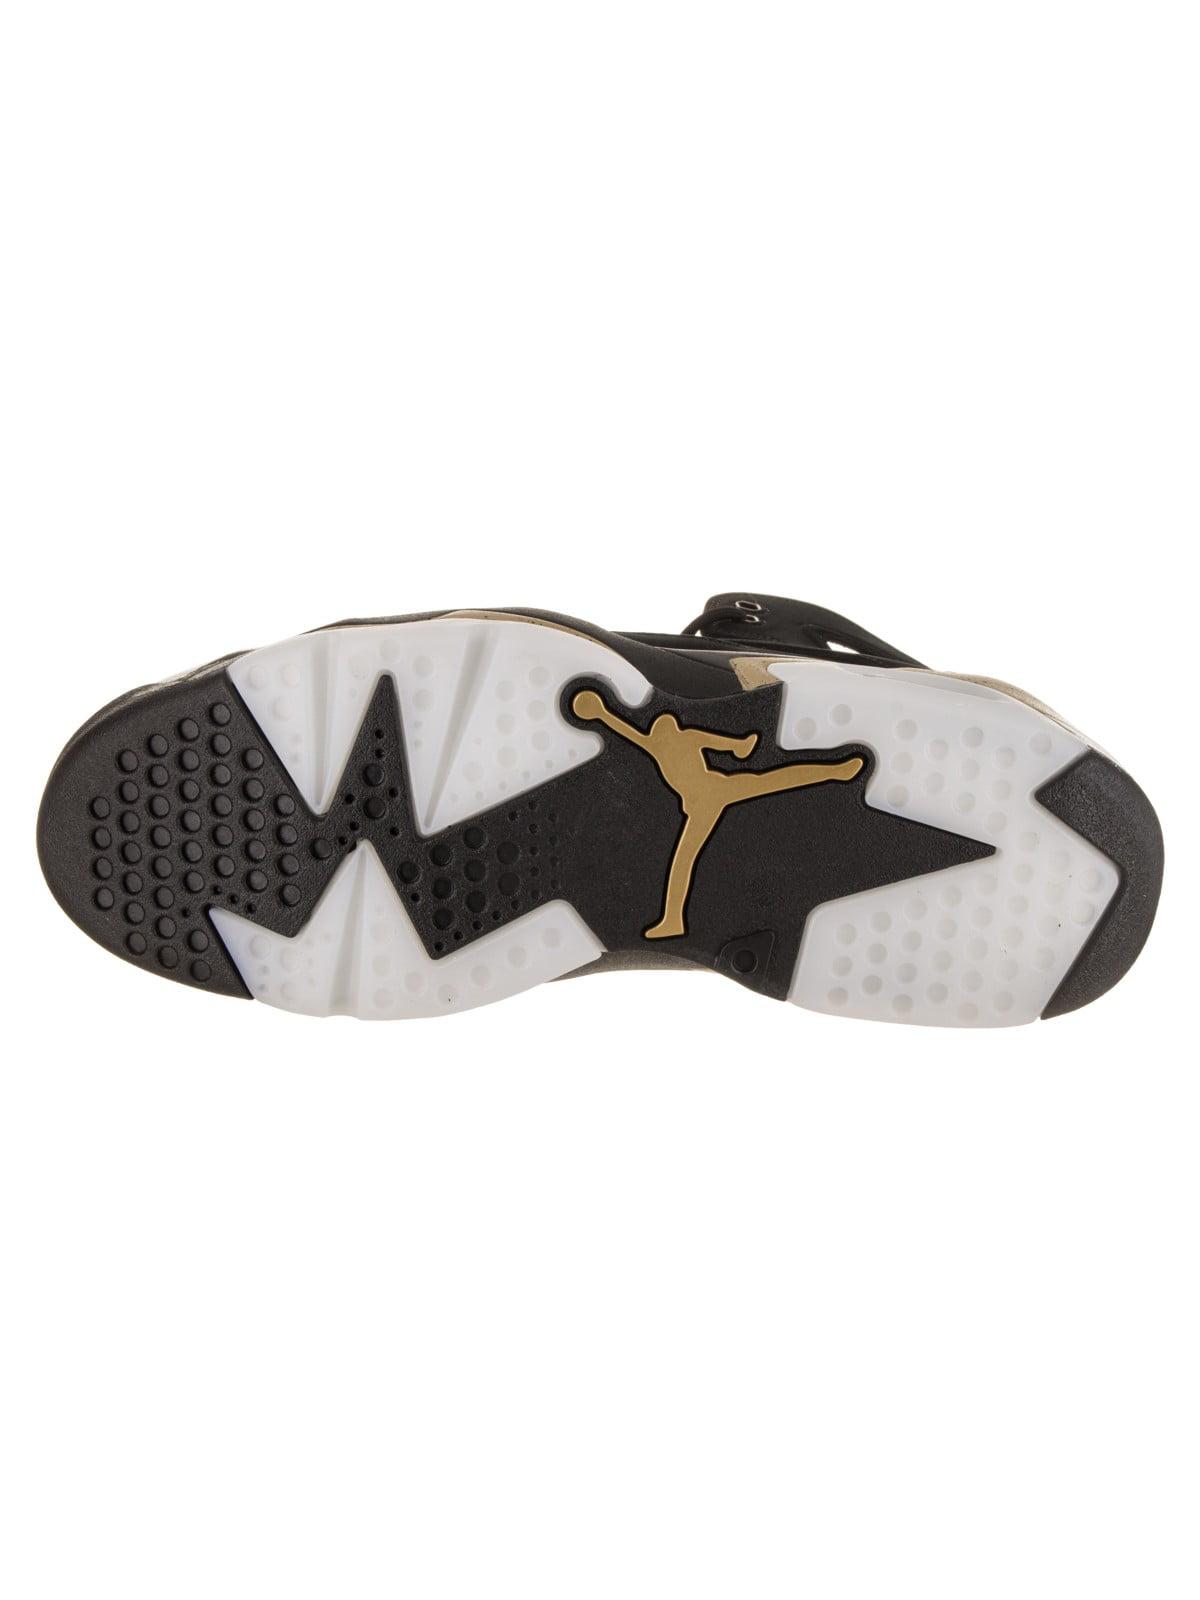 Mens Air Jordan Flight Club 91 Black White Metallic Gold 555475-031